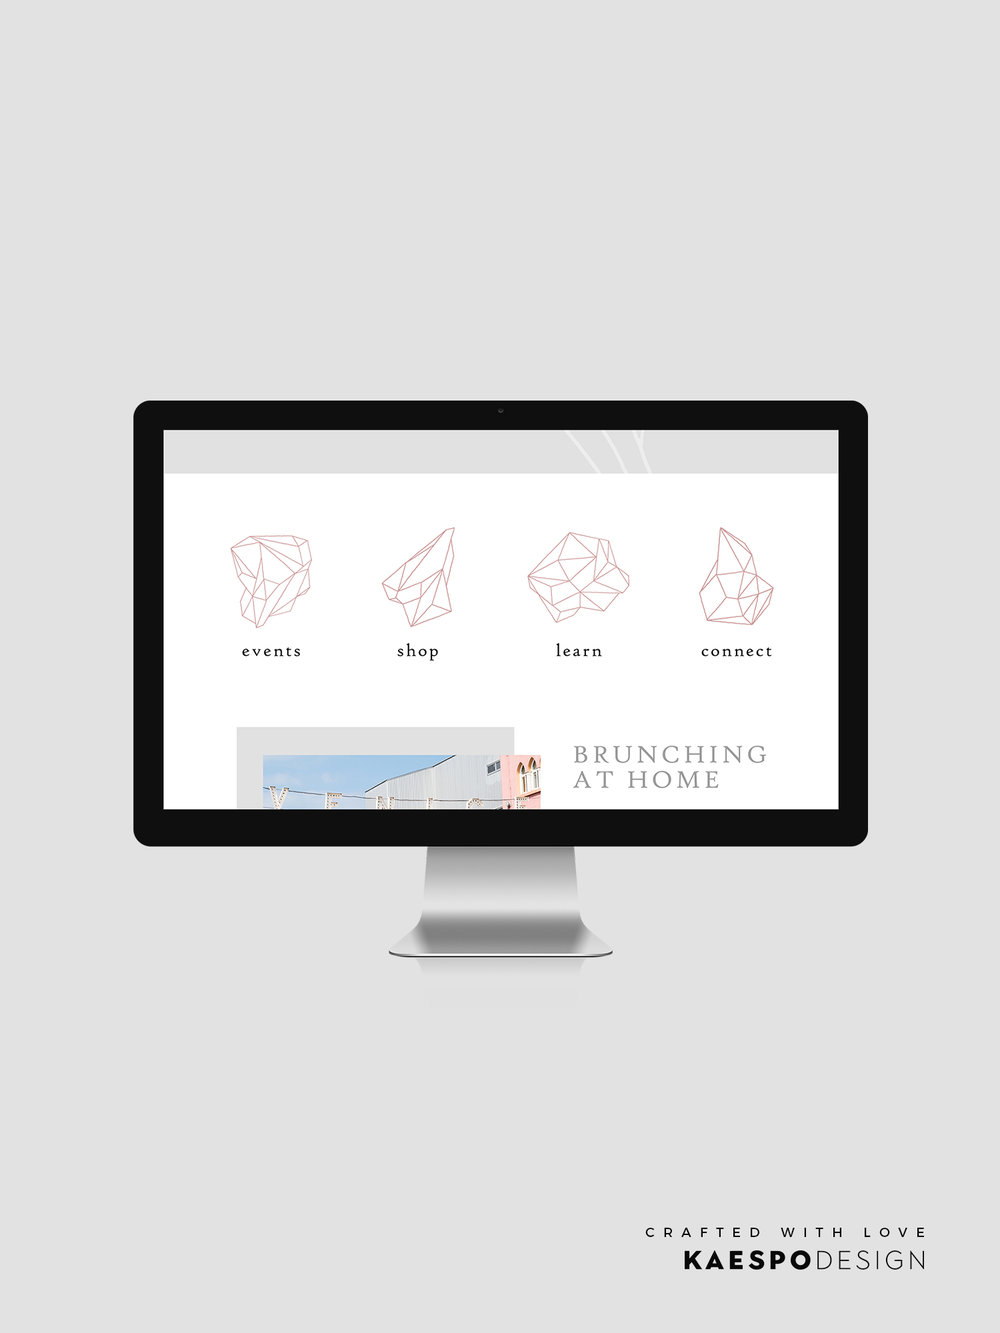 St Albert and Edmonton Web Graphic Design KAESPO 004.jpg